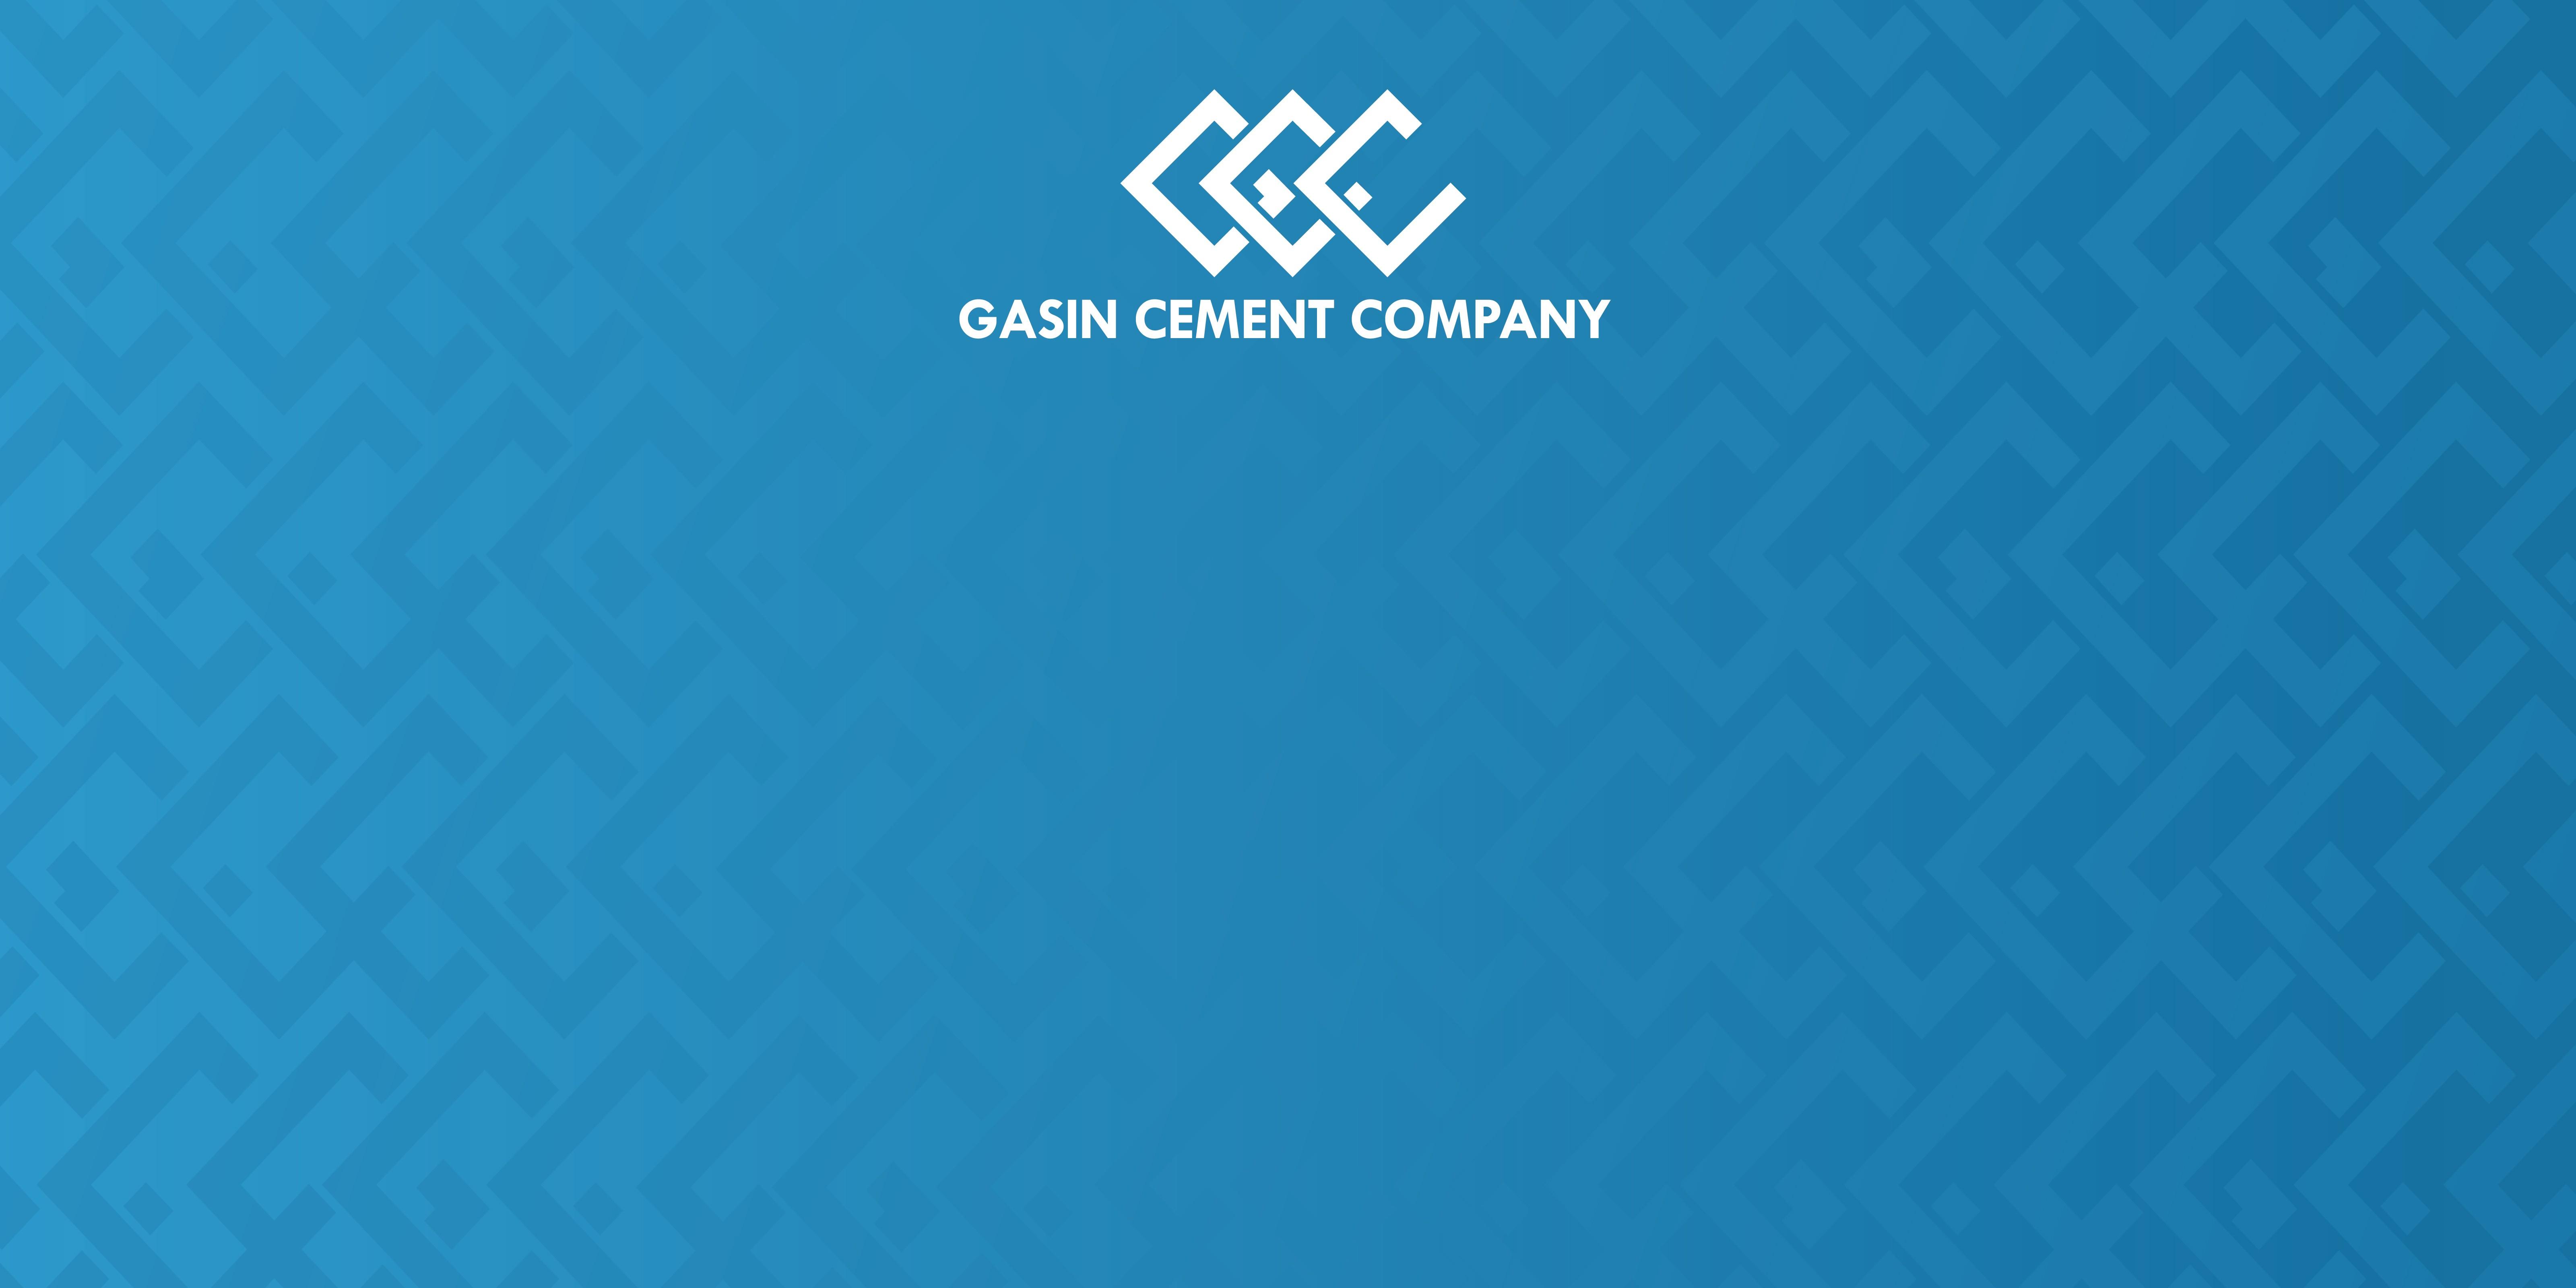 Gasin Cement Company | LinkedIn